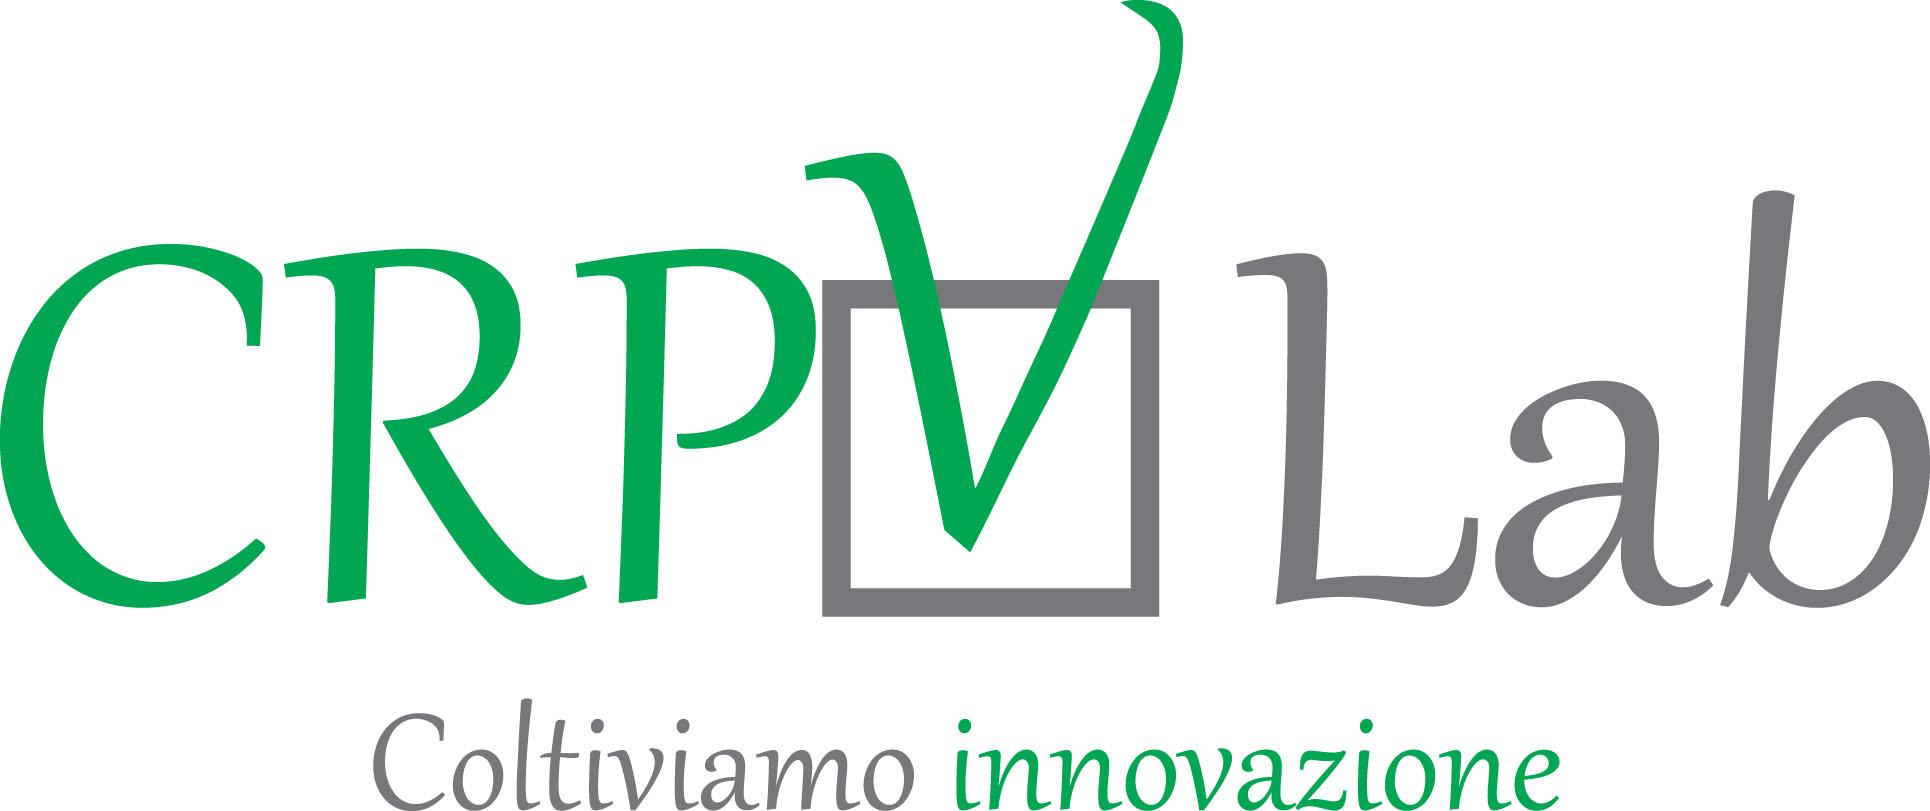 CRPV Lab